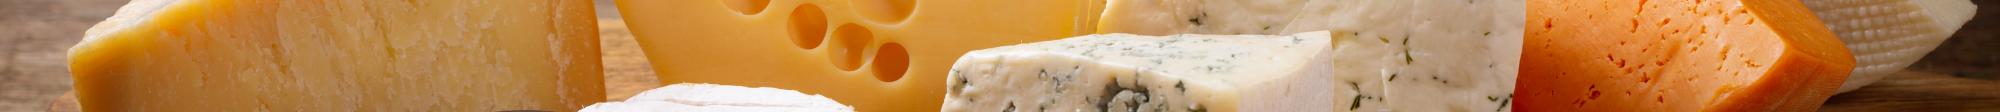 Comprar queso país de origen gourmet | Mixtura Gourmet